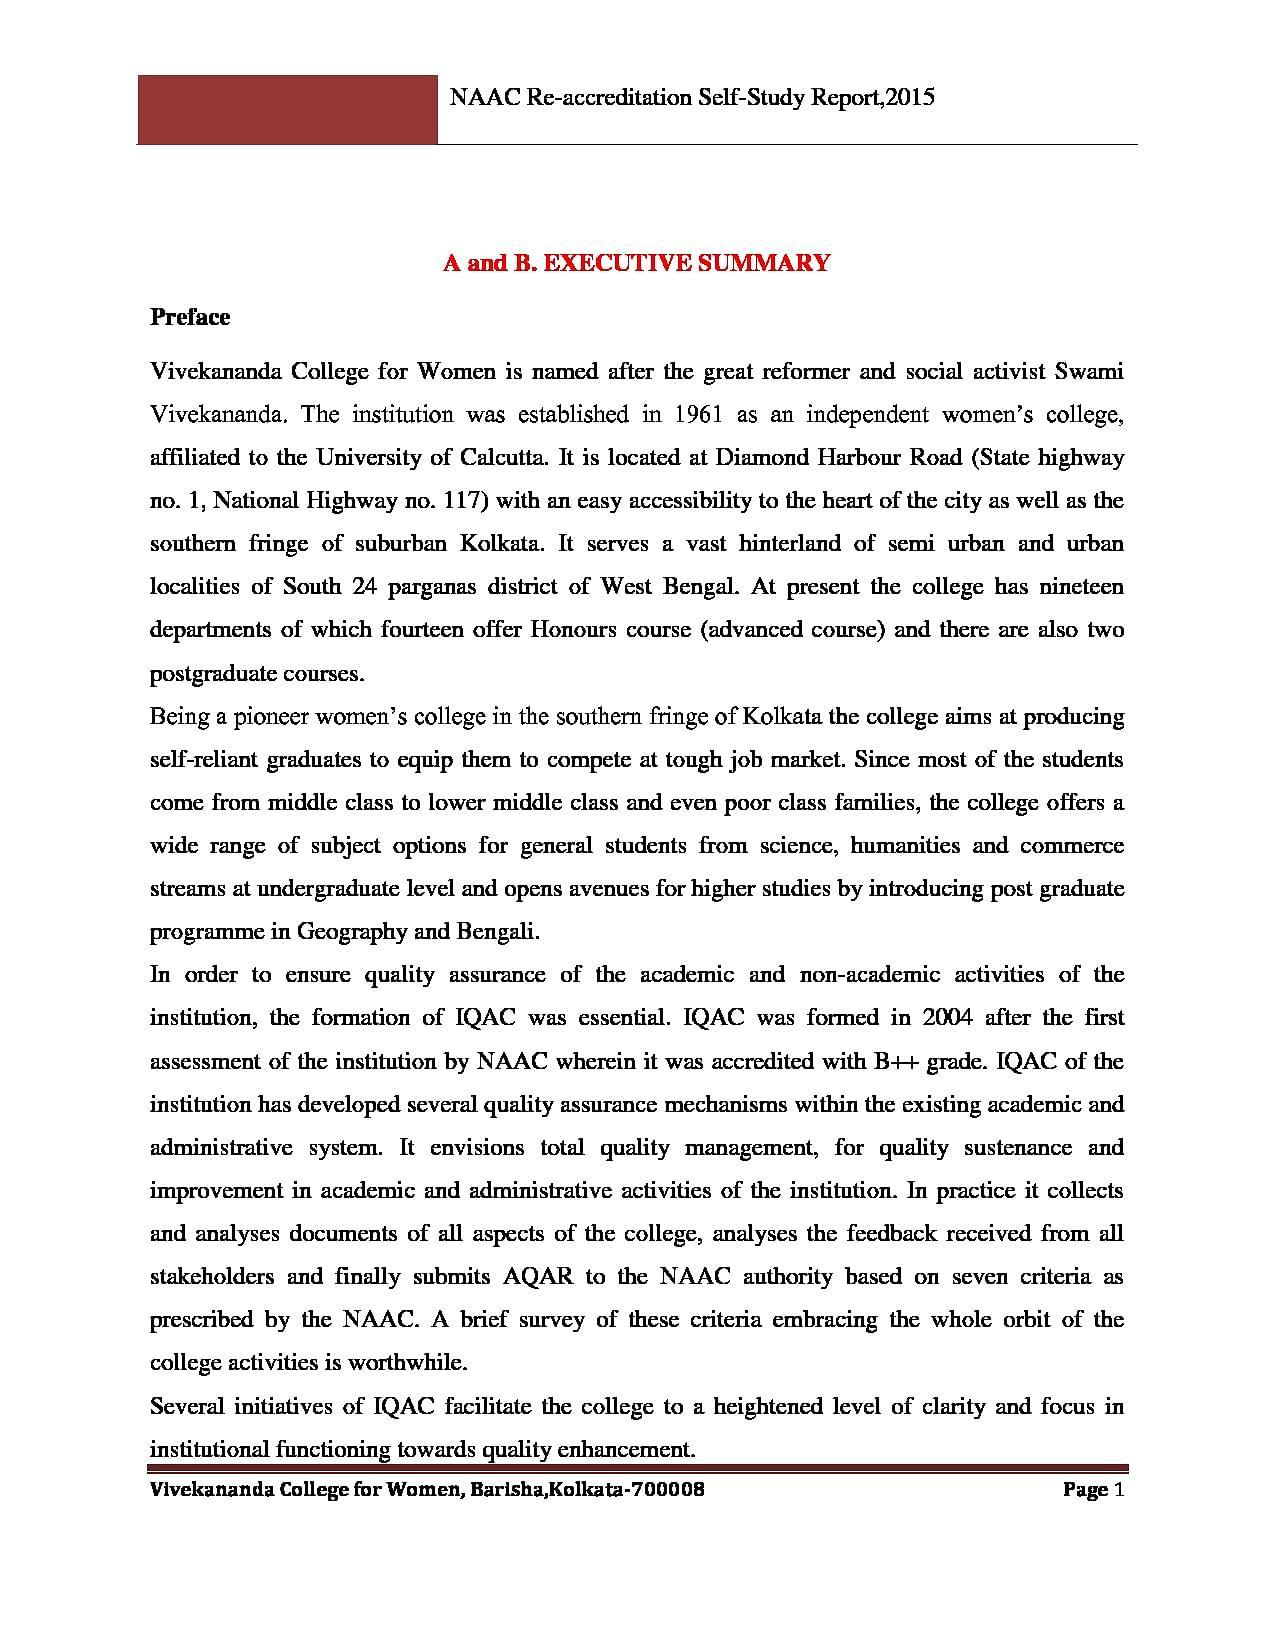 Accreditation Self-Study Document